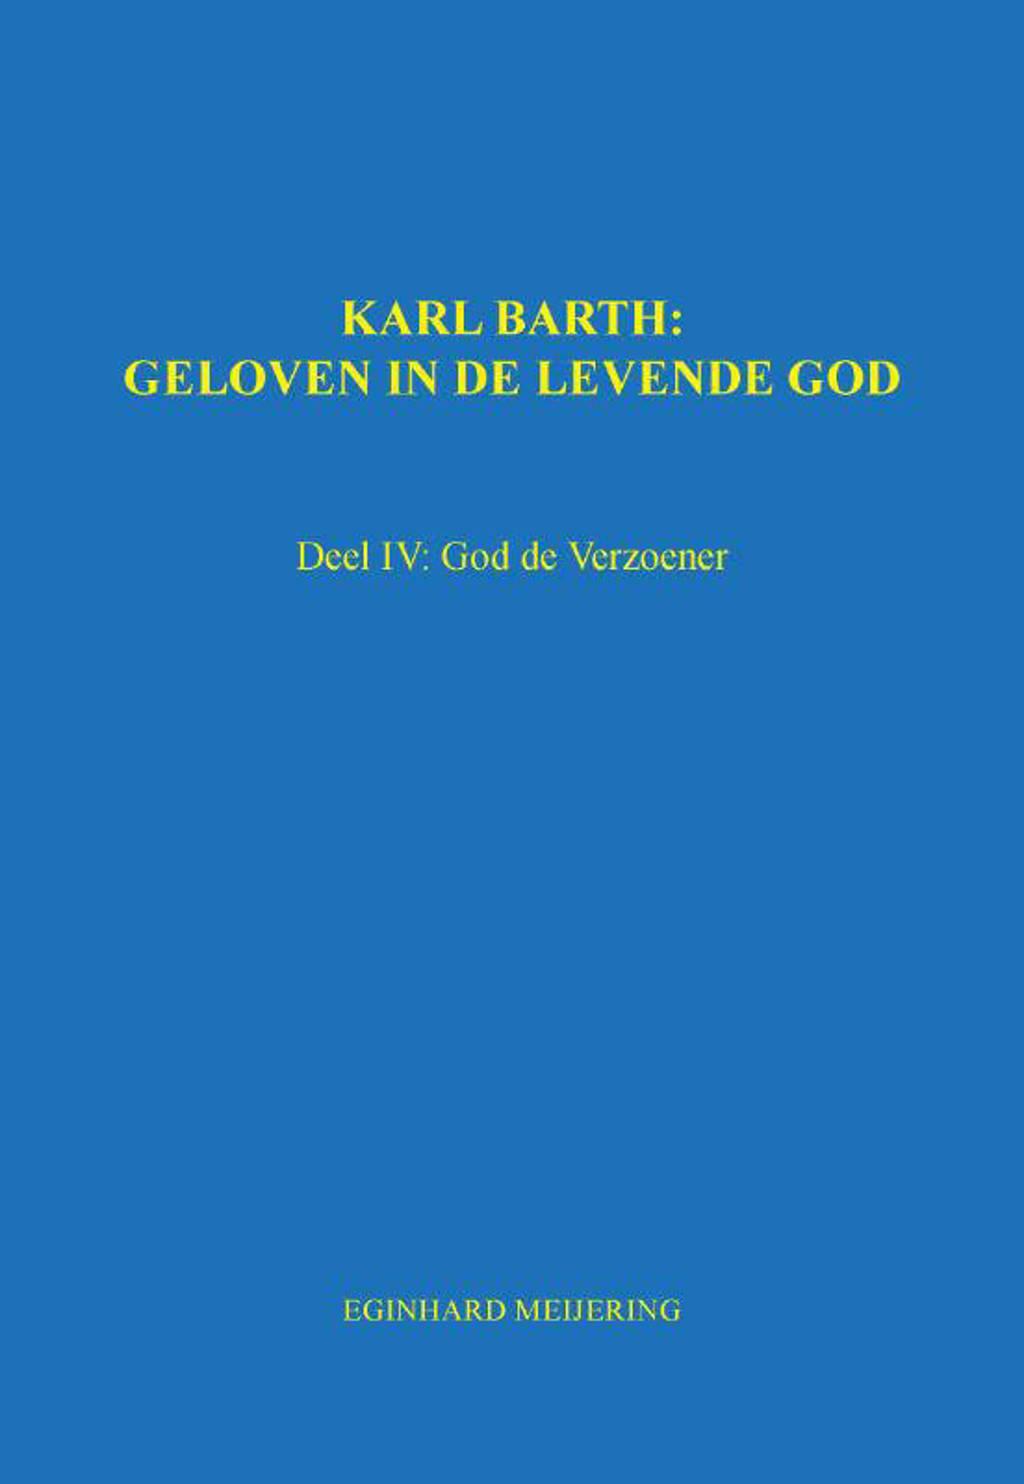 Karl Barth: Geloven in de levende god 4 - E.P. Meijering